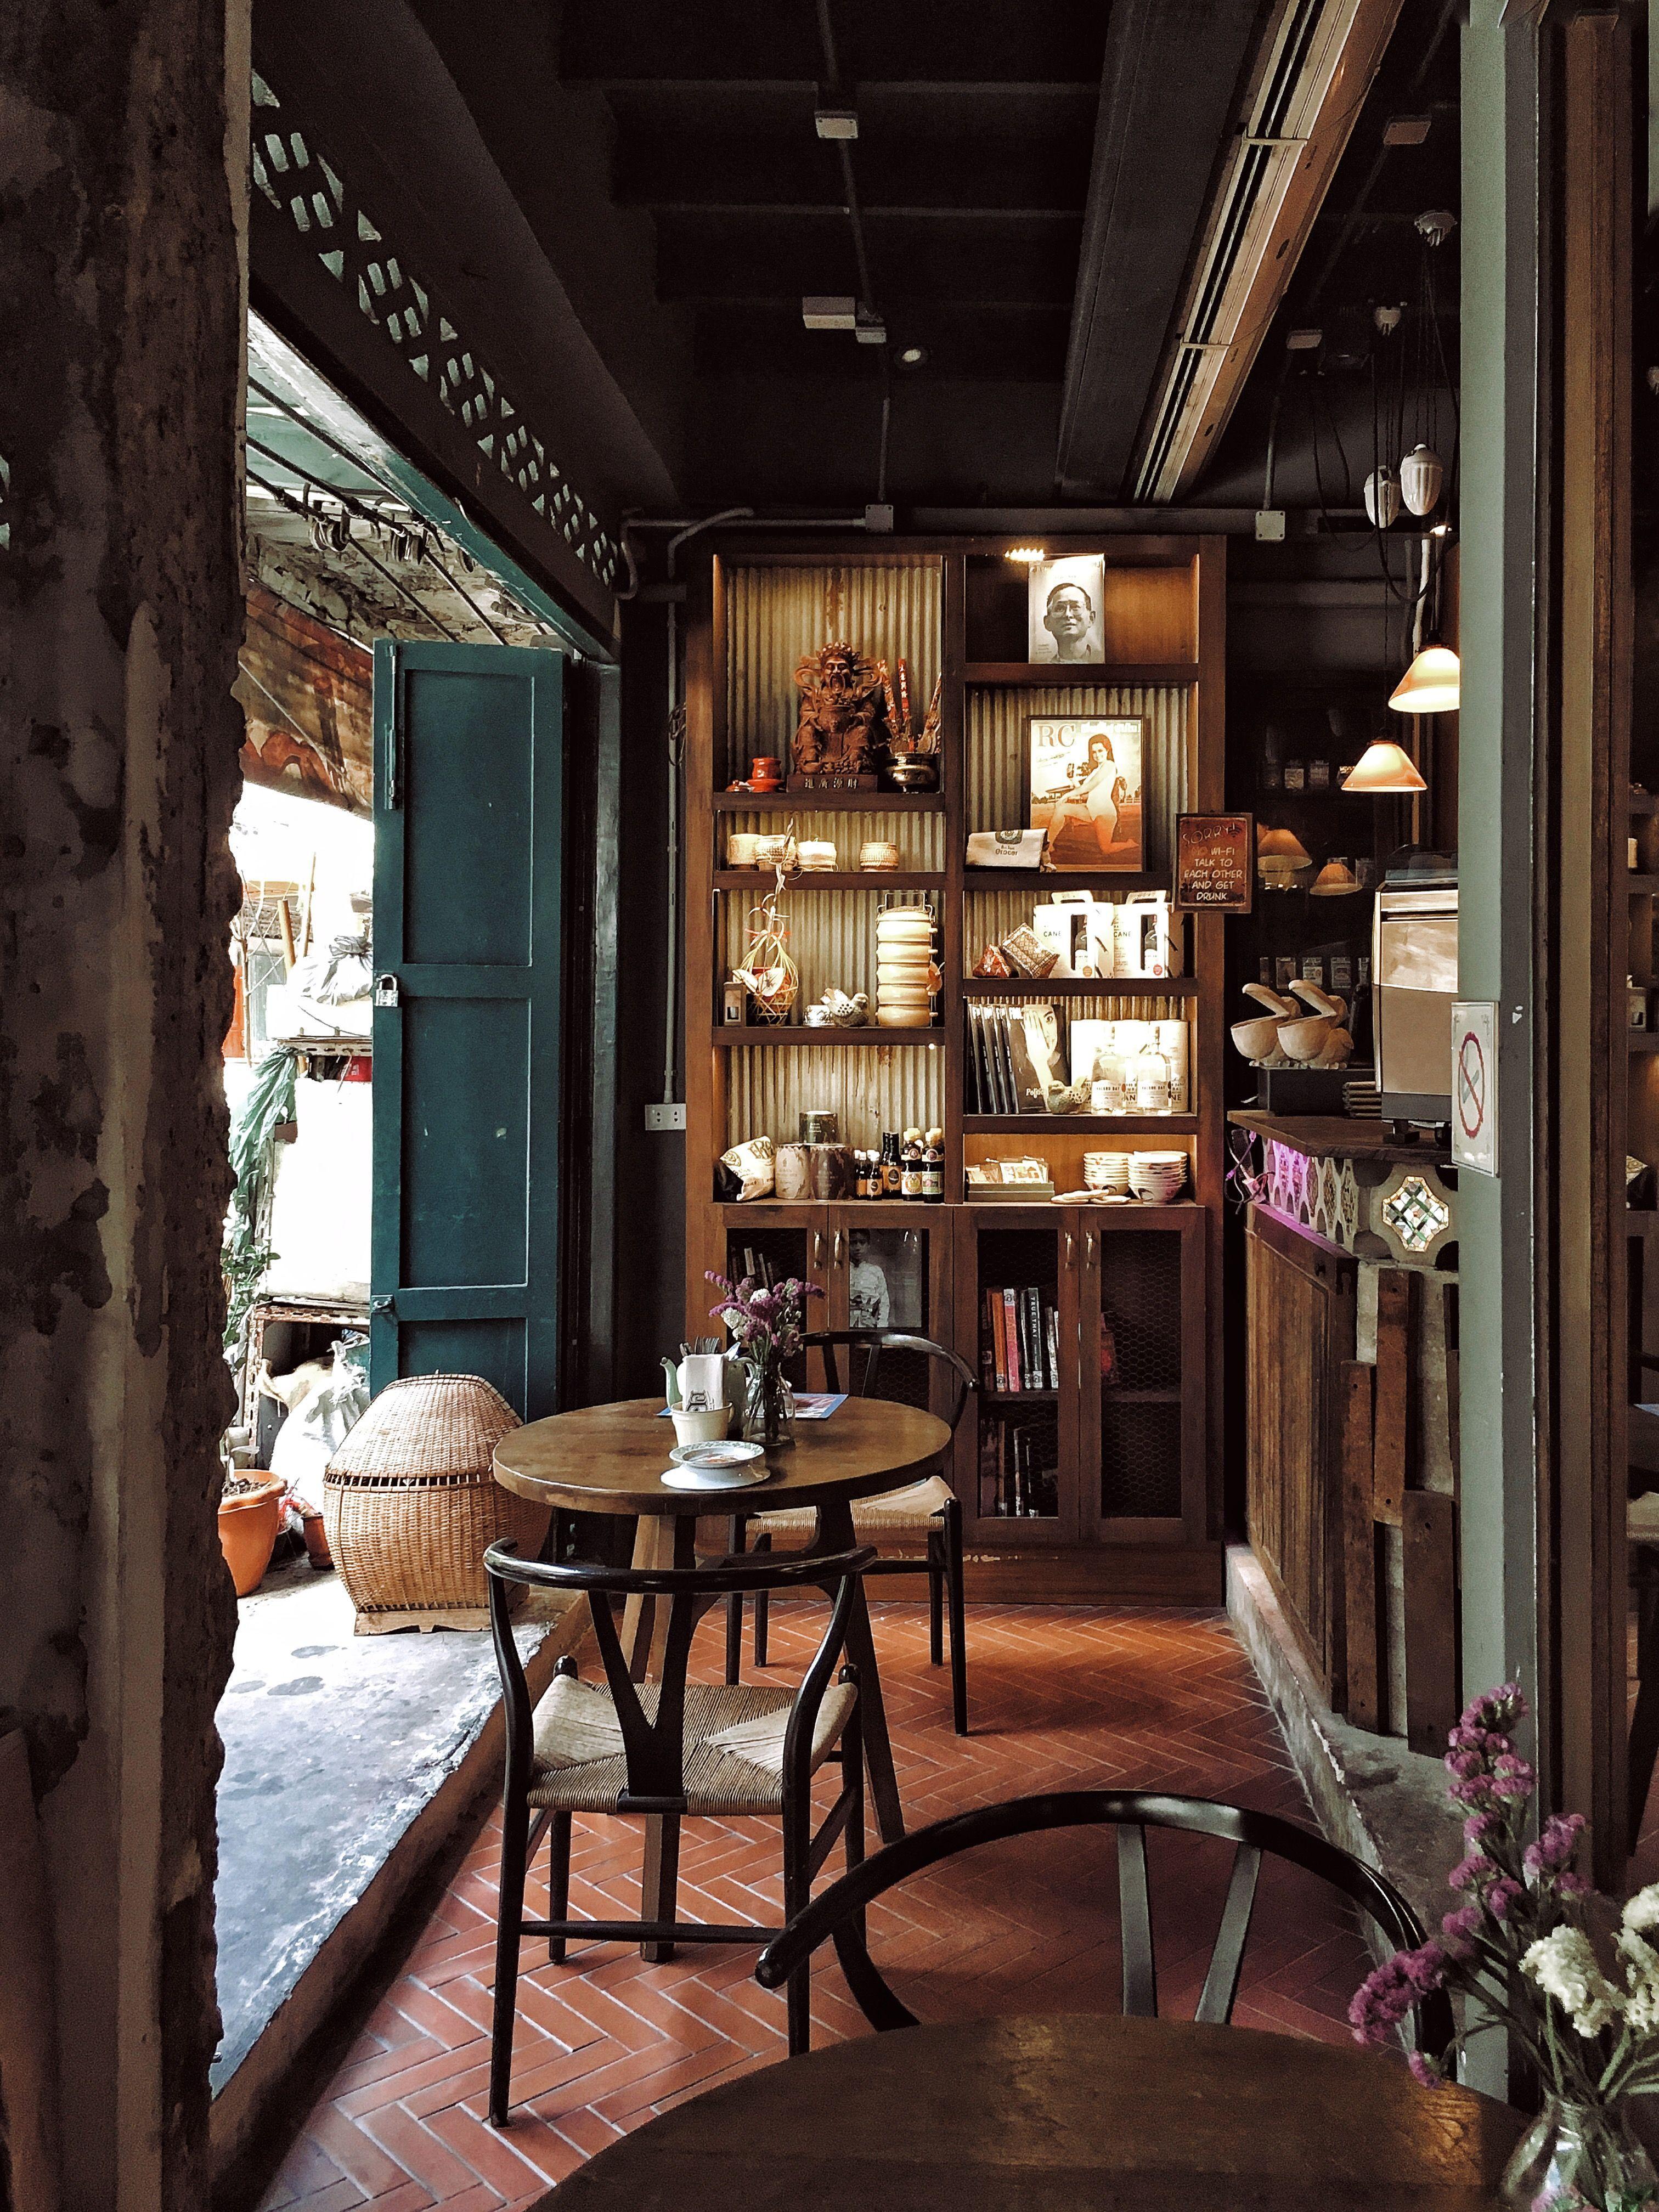 Goedkope Eclectic Decor Saleprice 43 In 2020 Restaurant Decor Restaurant Interior Design Cafe Design